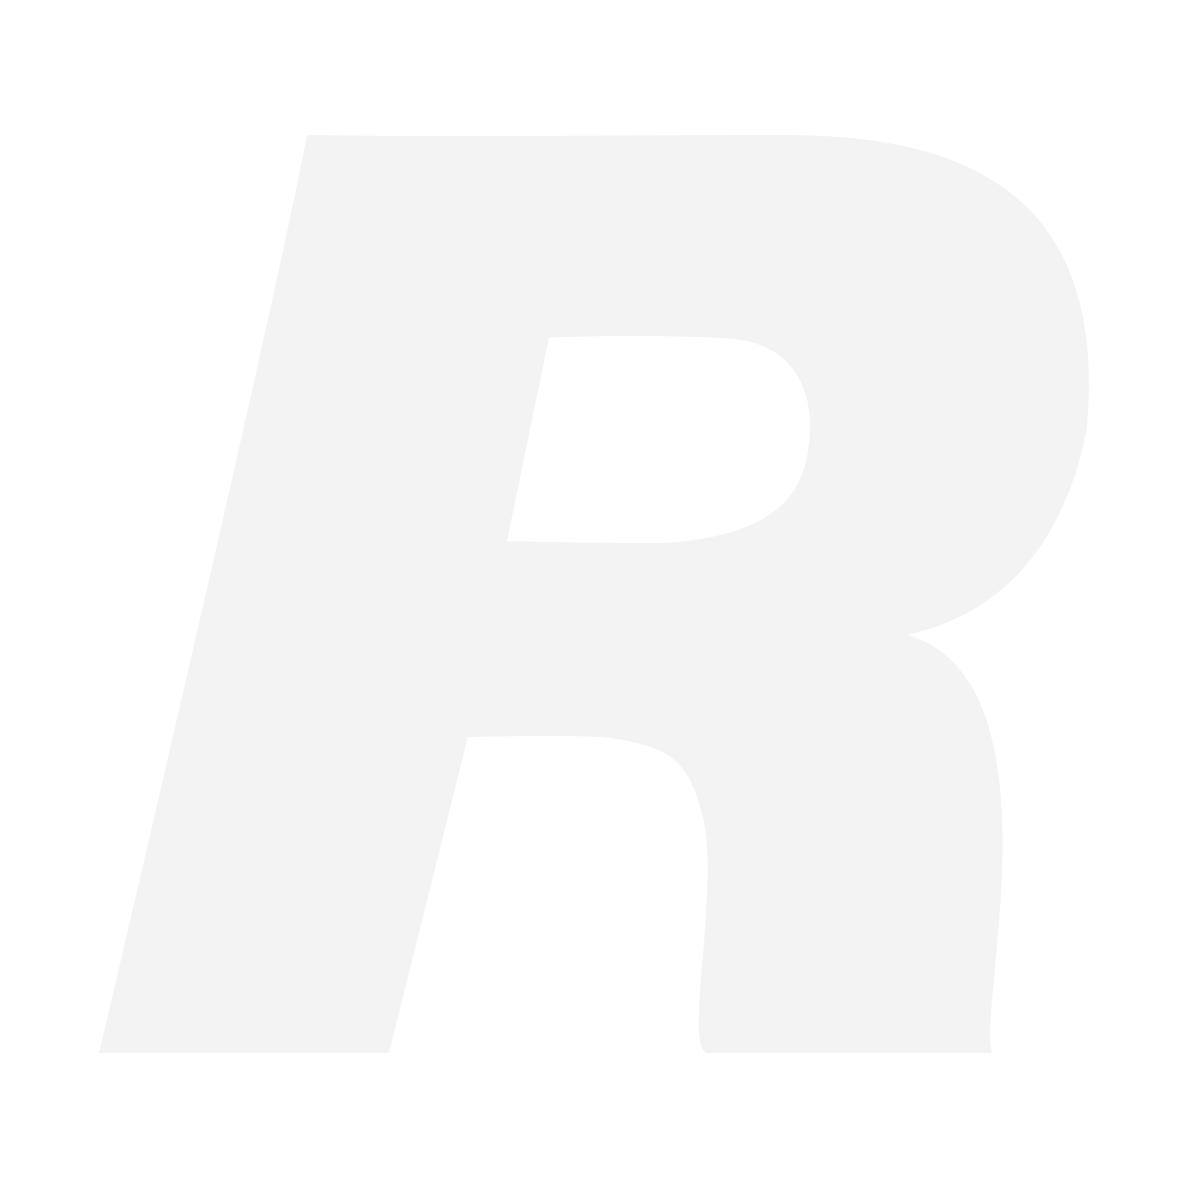 SONY SEL 24mm f/1.8 ZA ZEISS SONNAR KÄYTETTY (SIS.ALV.24%)